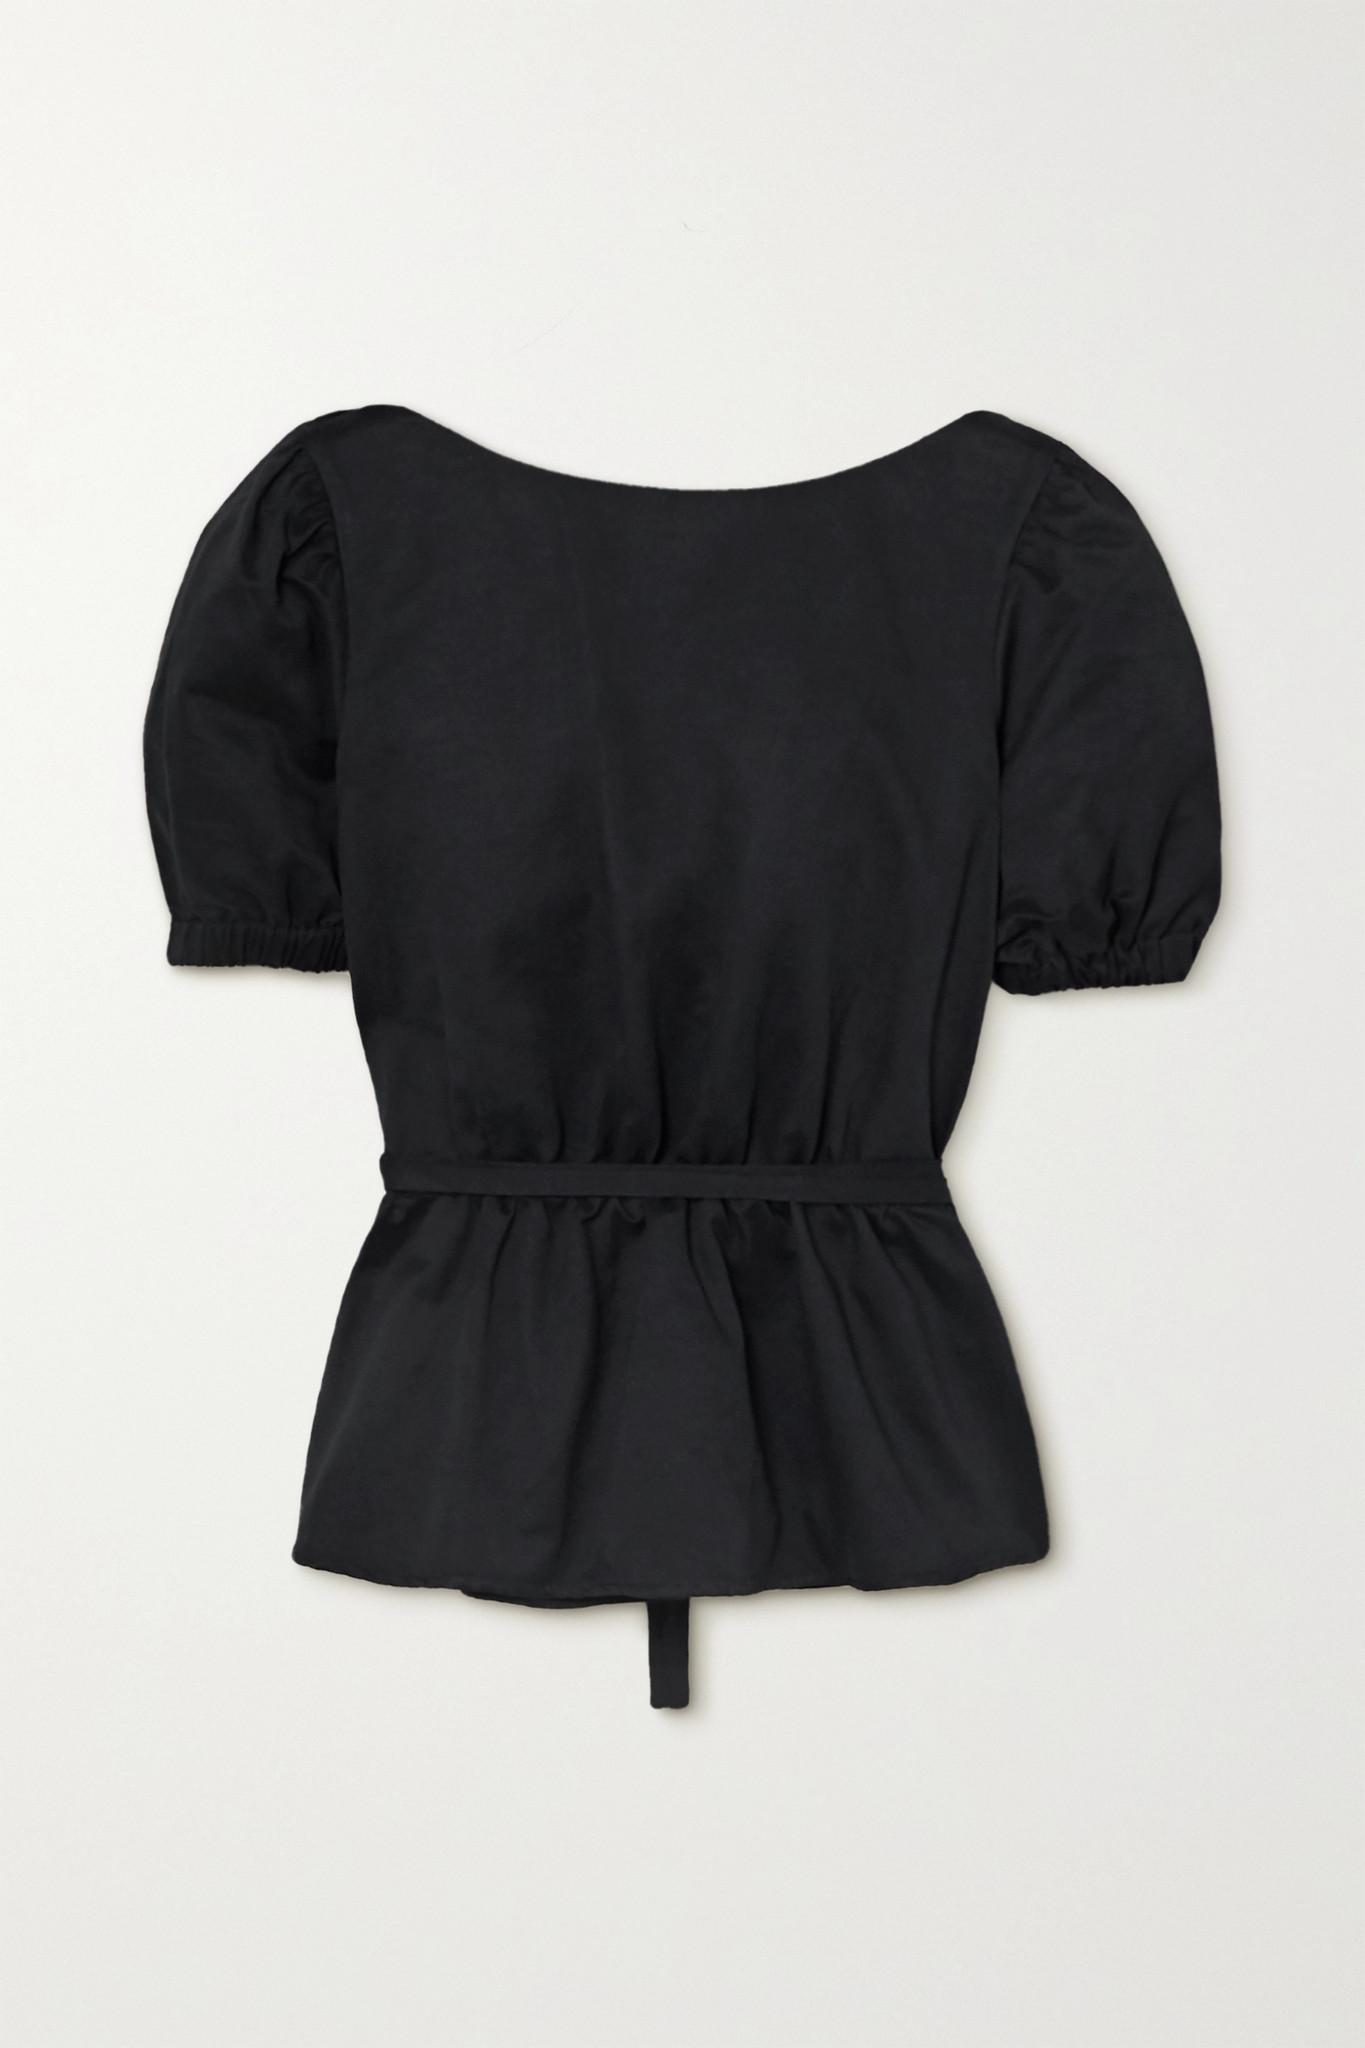 STAUD - Marie 露背棉质混纺罗缎荷叶腰摆上衣 - 黑色 - small